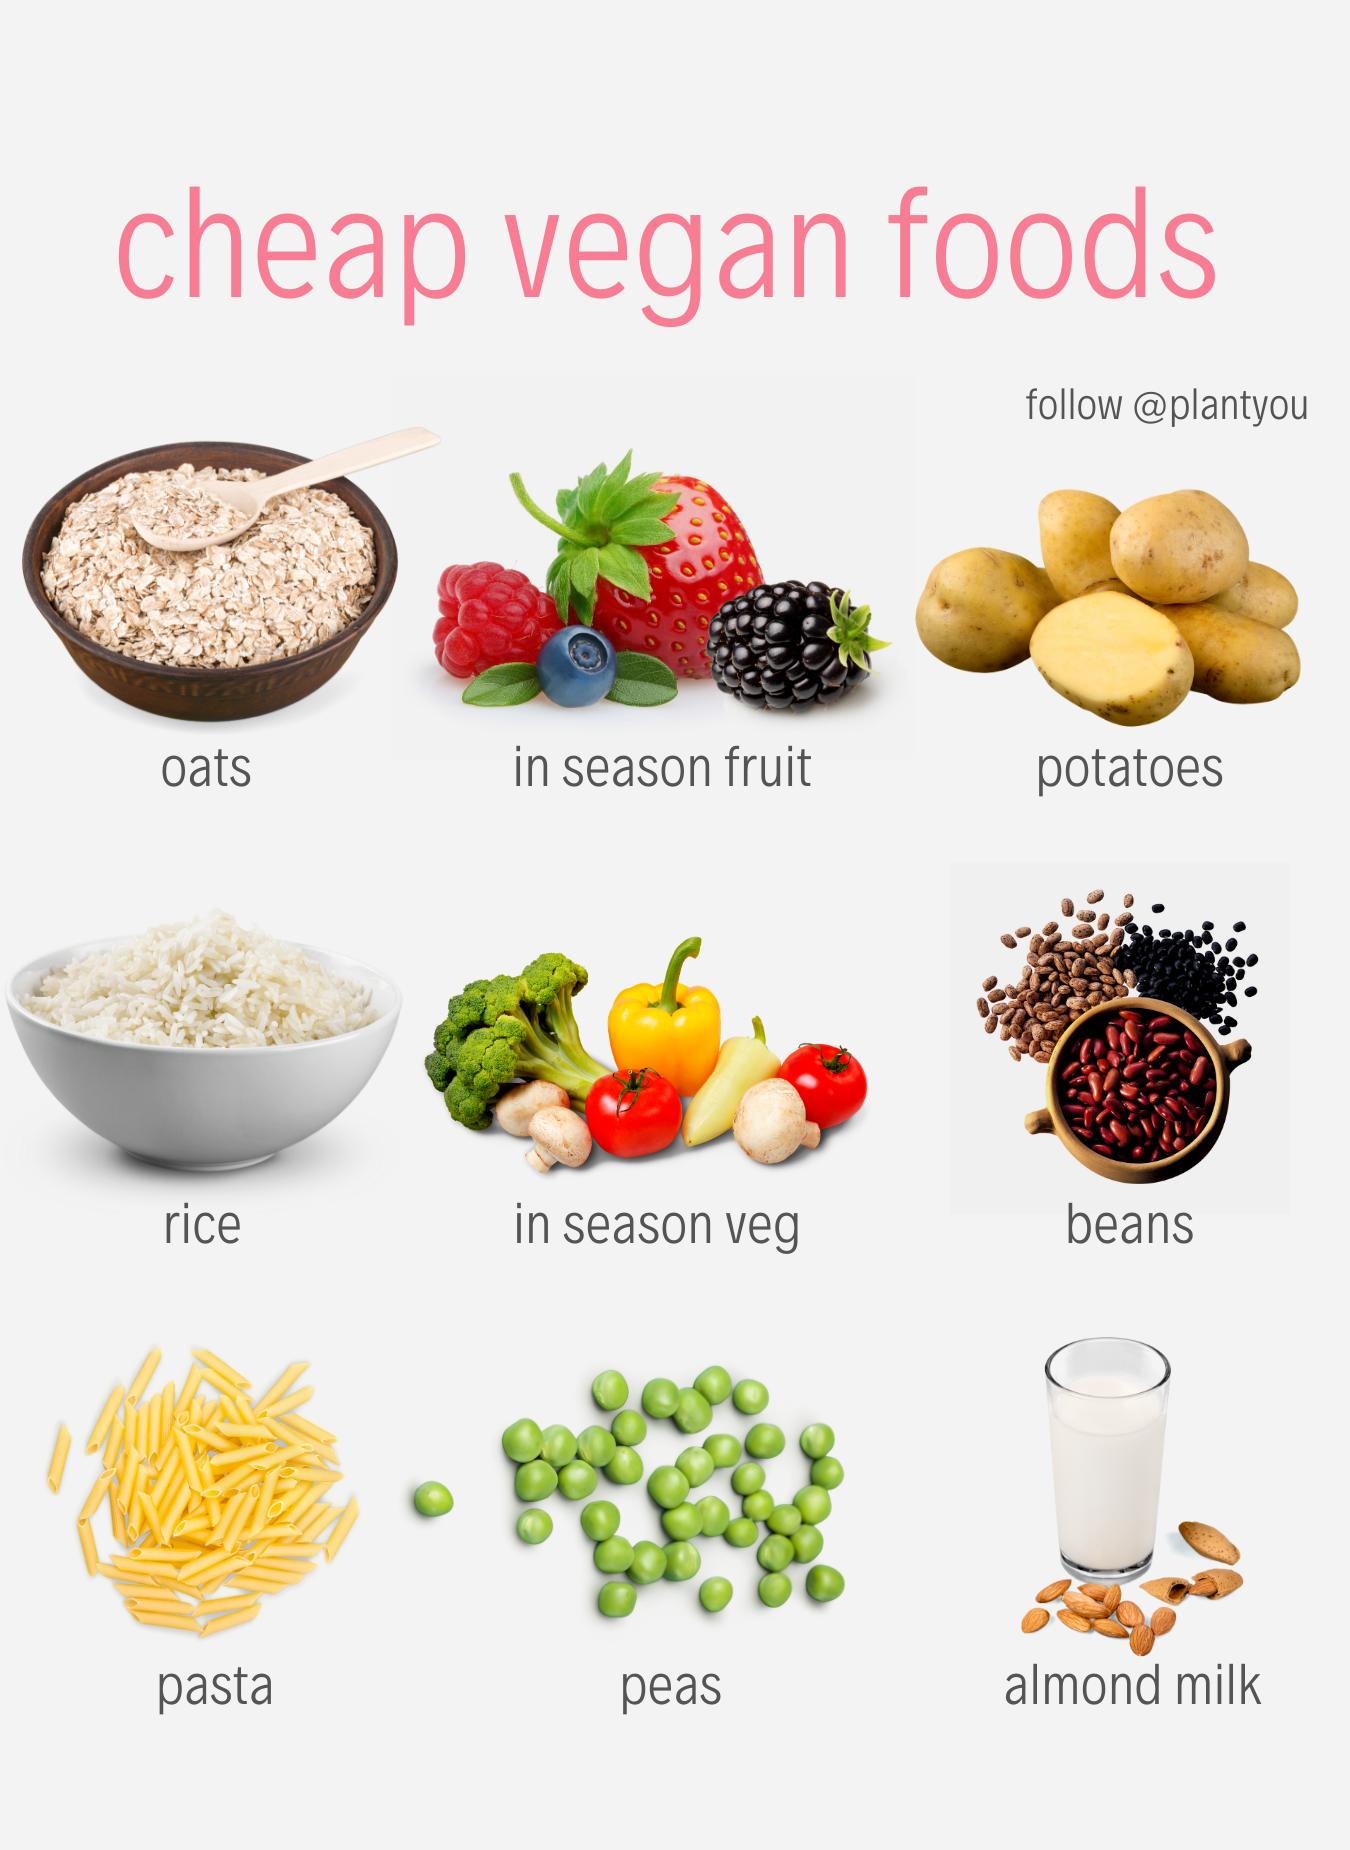 Cheap Vegan Food Budget Vegan Recipes Plant Based Budget Recipes Vegan On A Budget Vegan Recipes Plant Based Vegan Meal Plans Vegan Recipes Easy